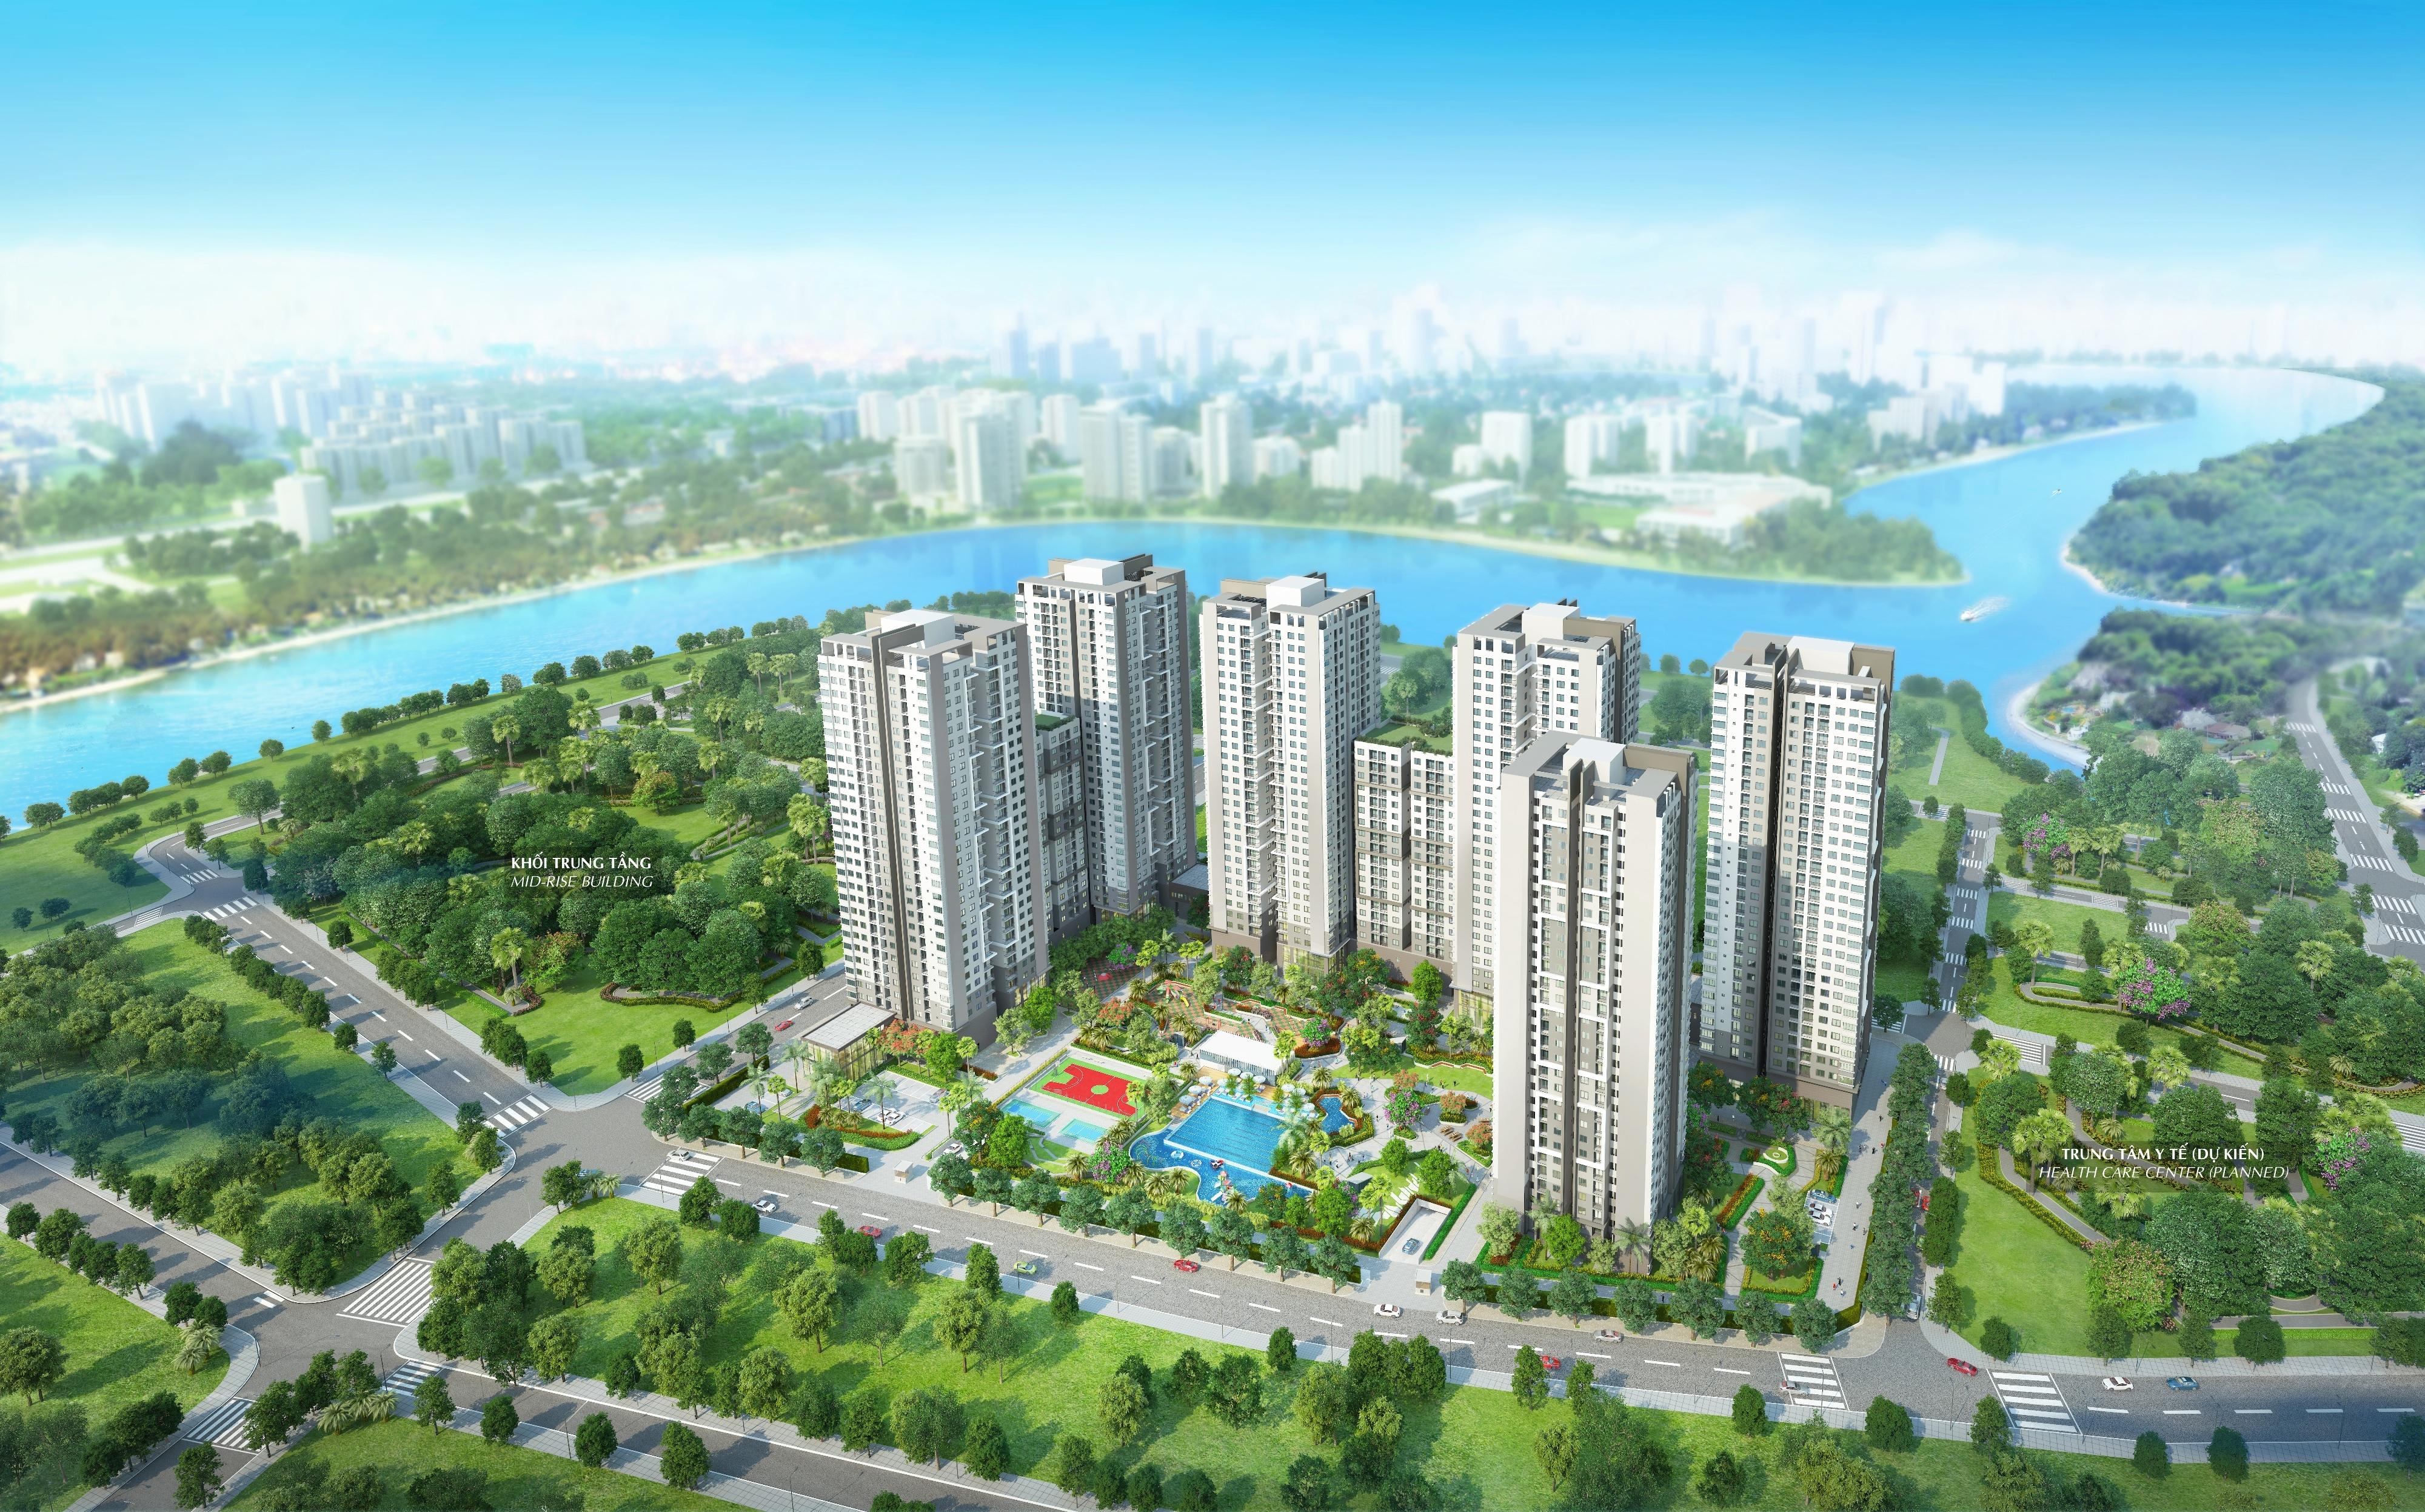 Phoi-canh-cong-trinh-2751-1575888300.jpg